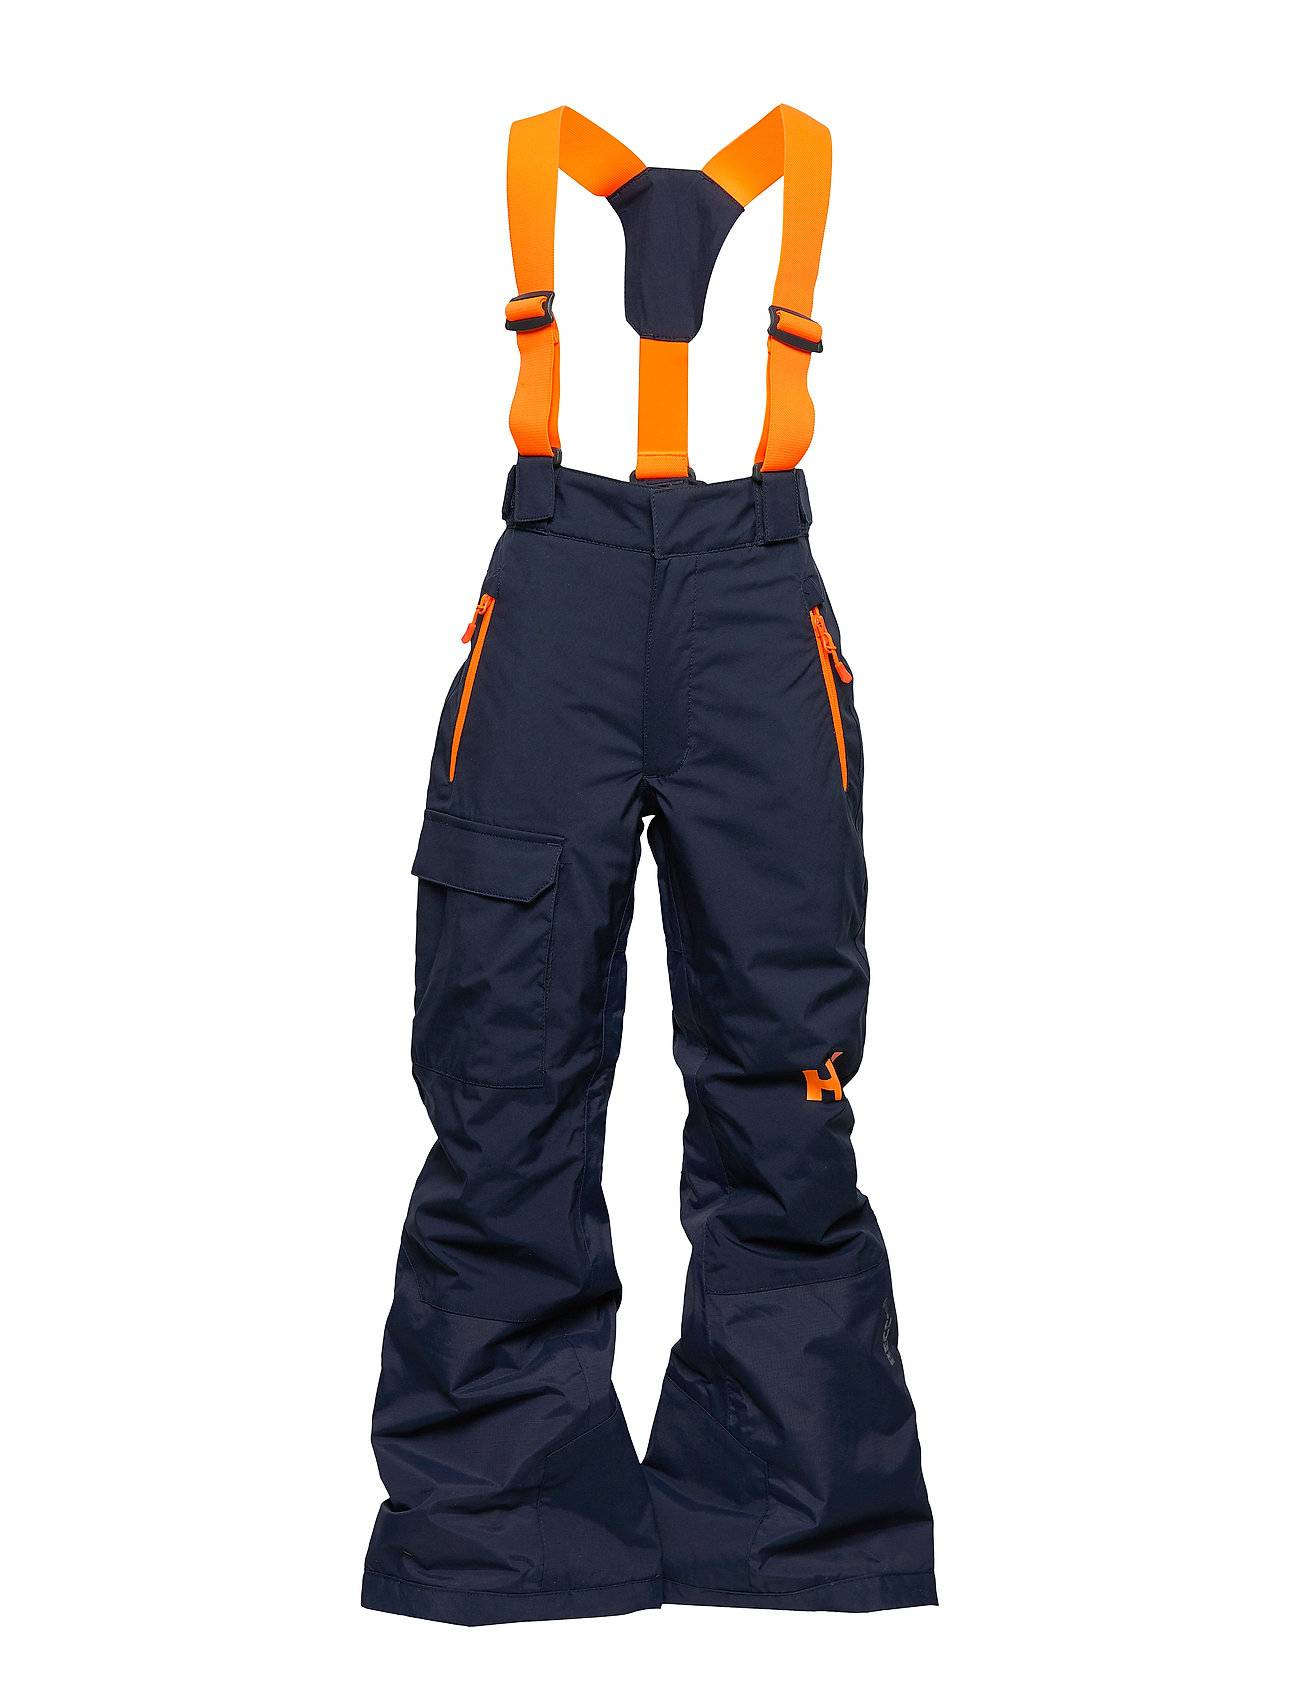 Helly Hansen Jr No Limits Pant Outerwear Thermo Outerwear Thermo Trousers Sininen Helly Hansen